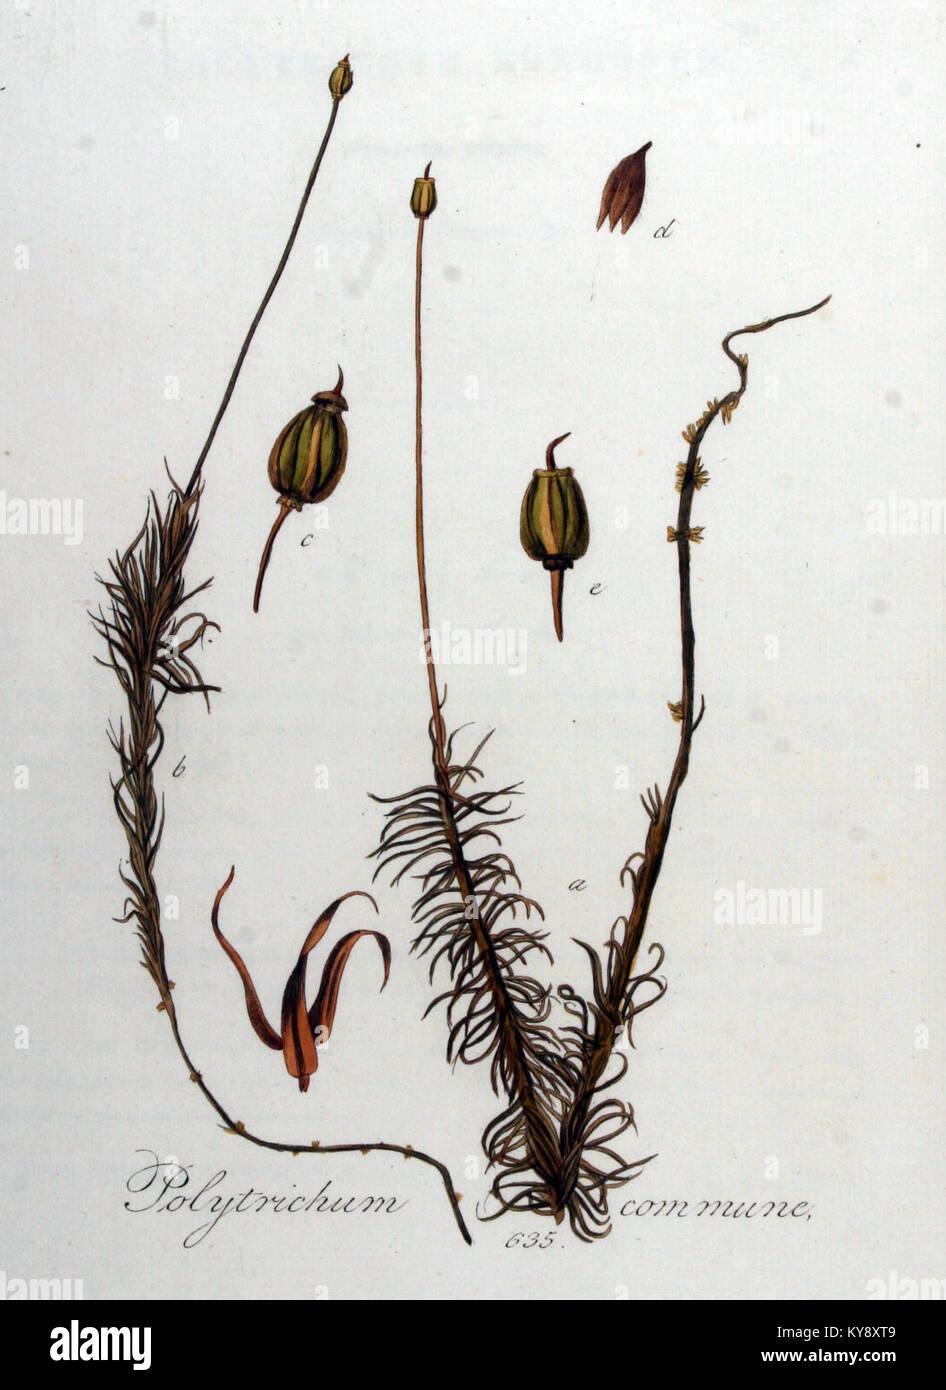 hight resolution of polytrichum commune flora batava volume v8 stock image